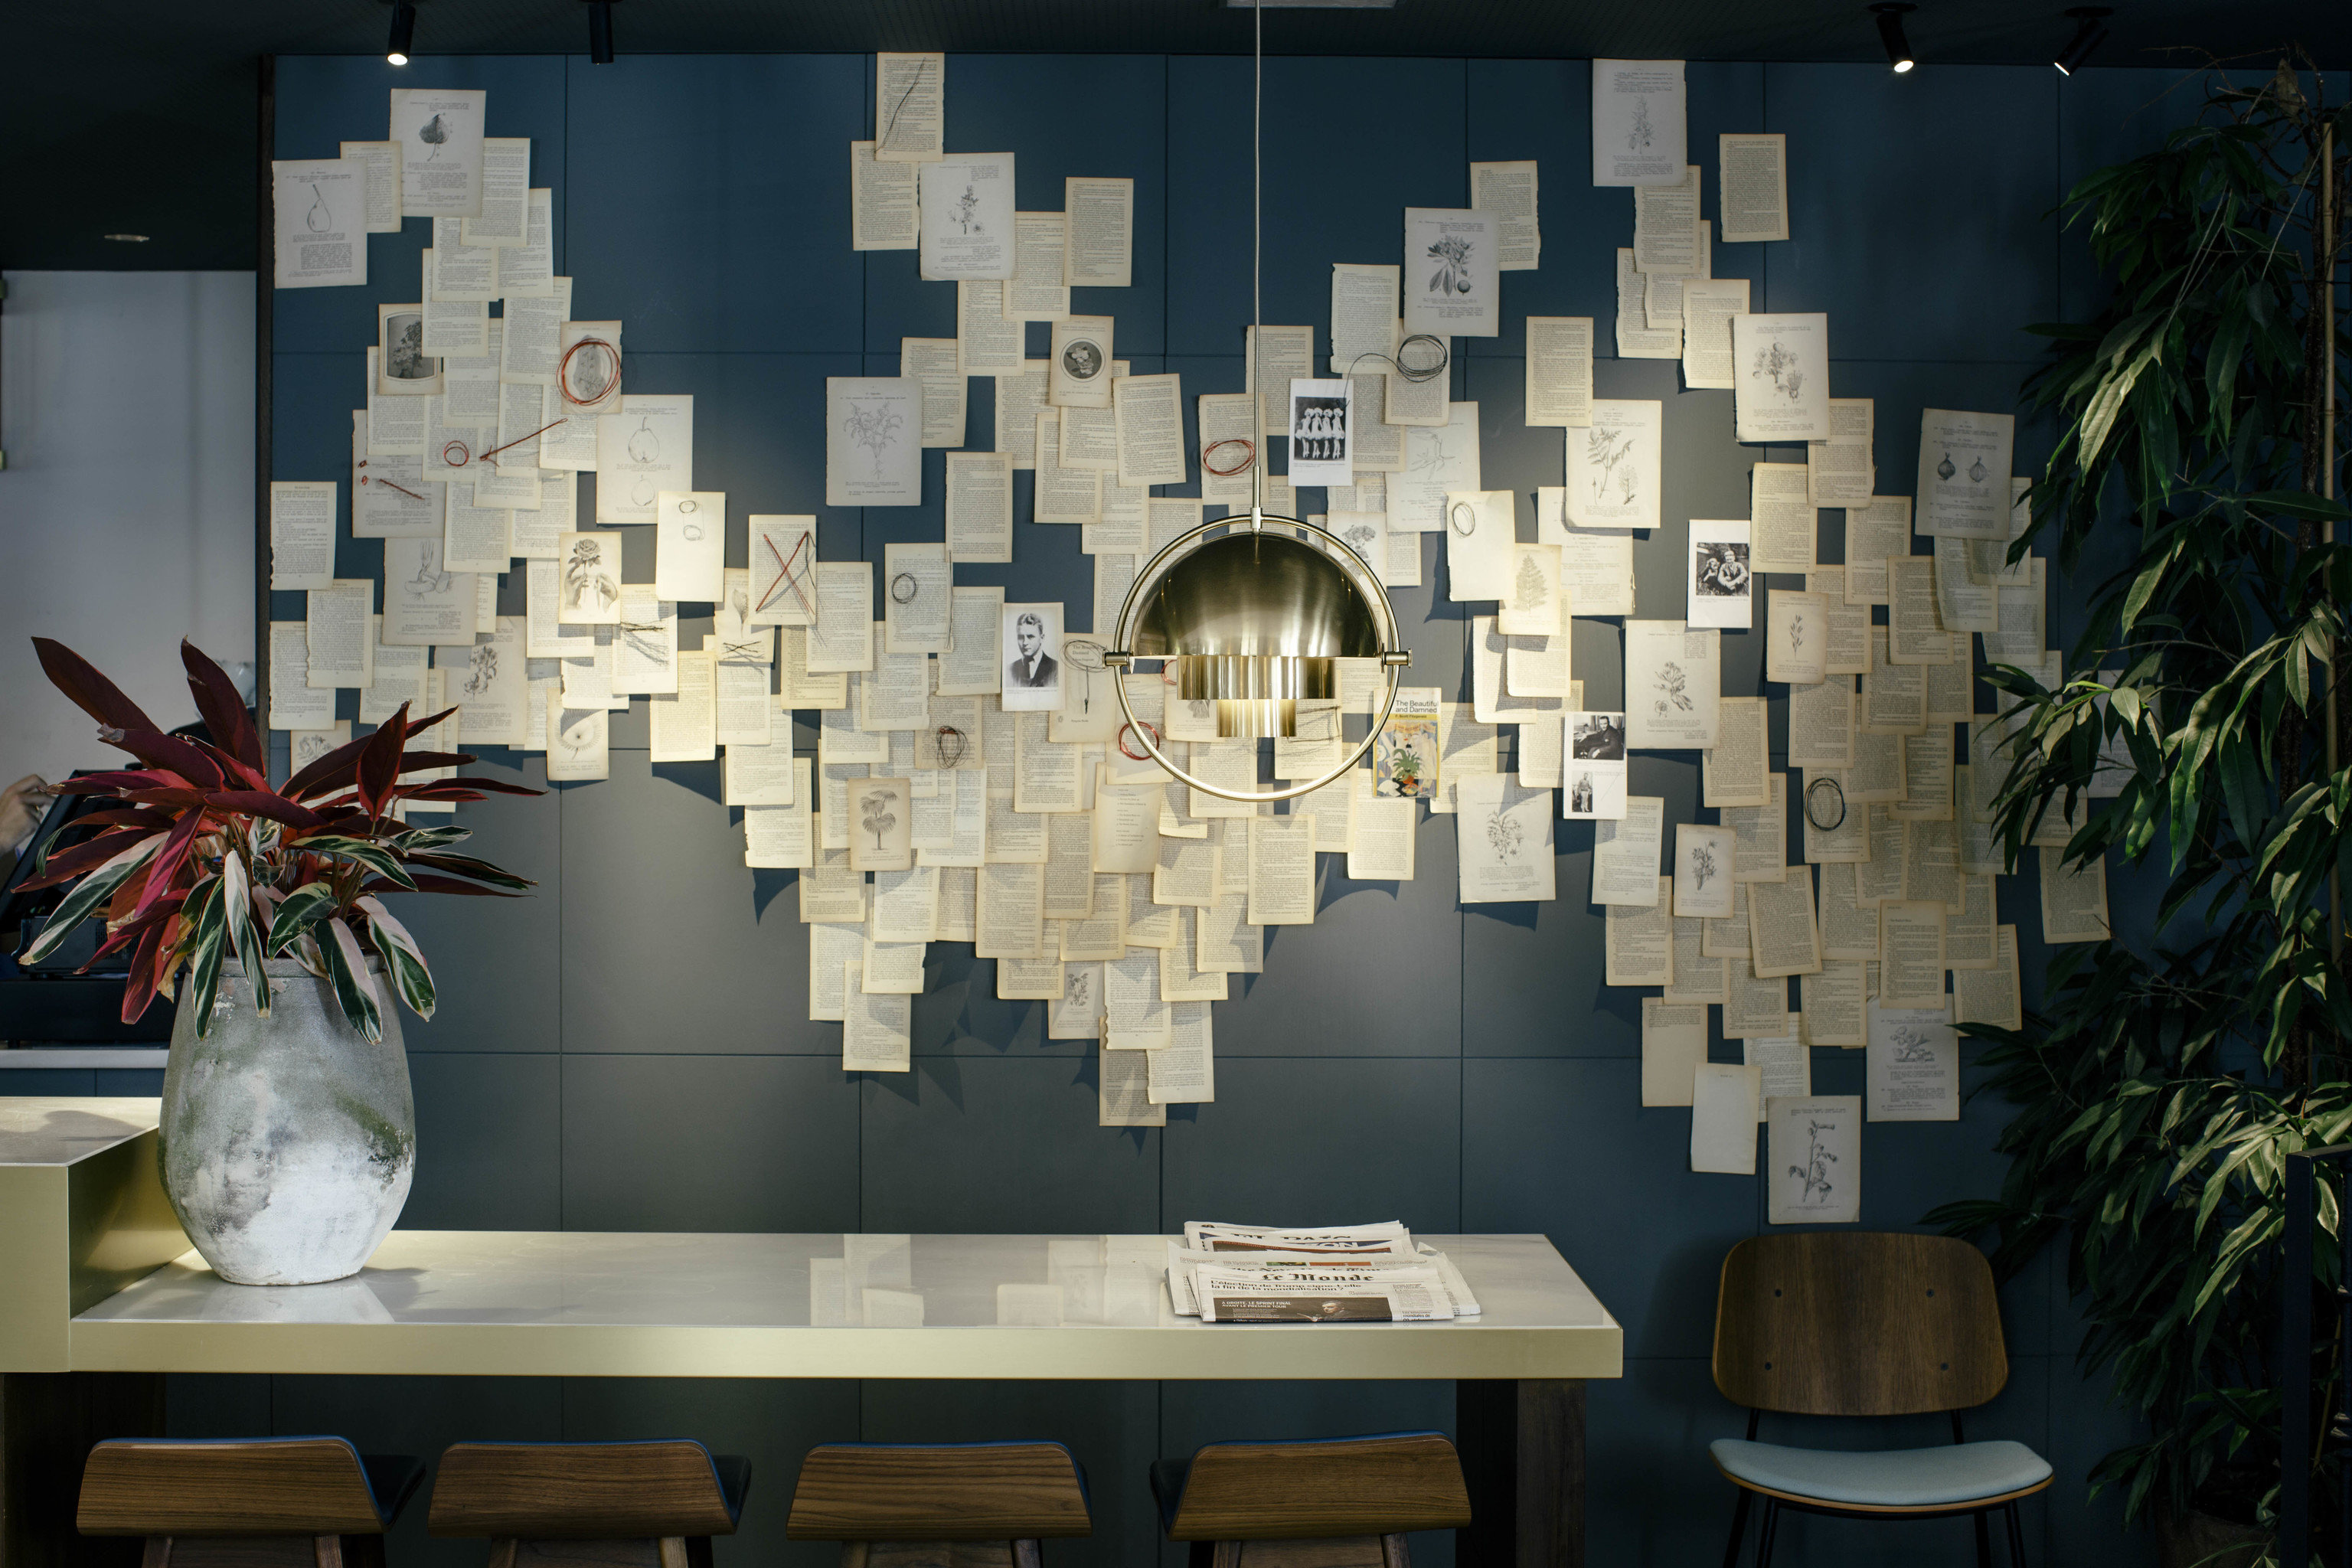 Hotels wall art modern art Design interior design living room